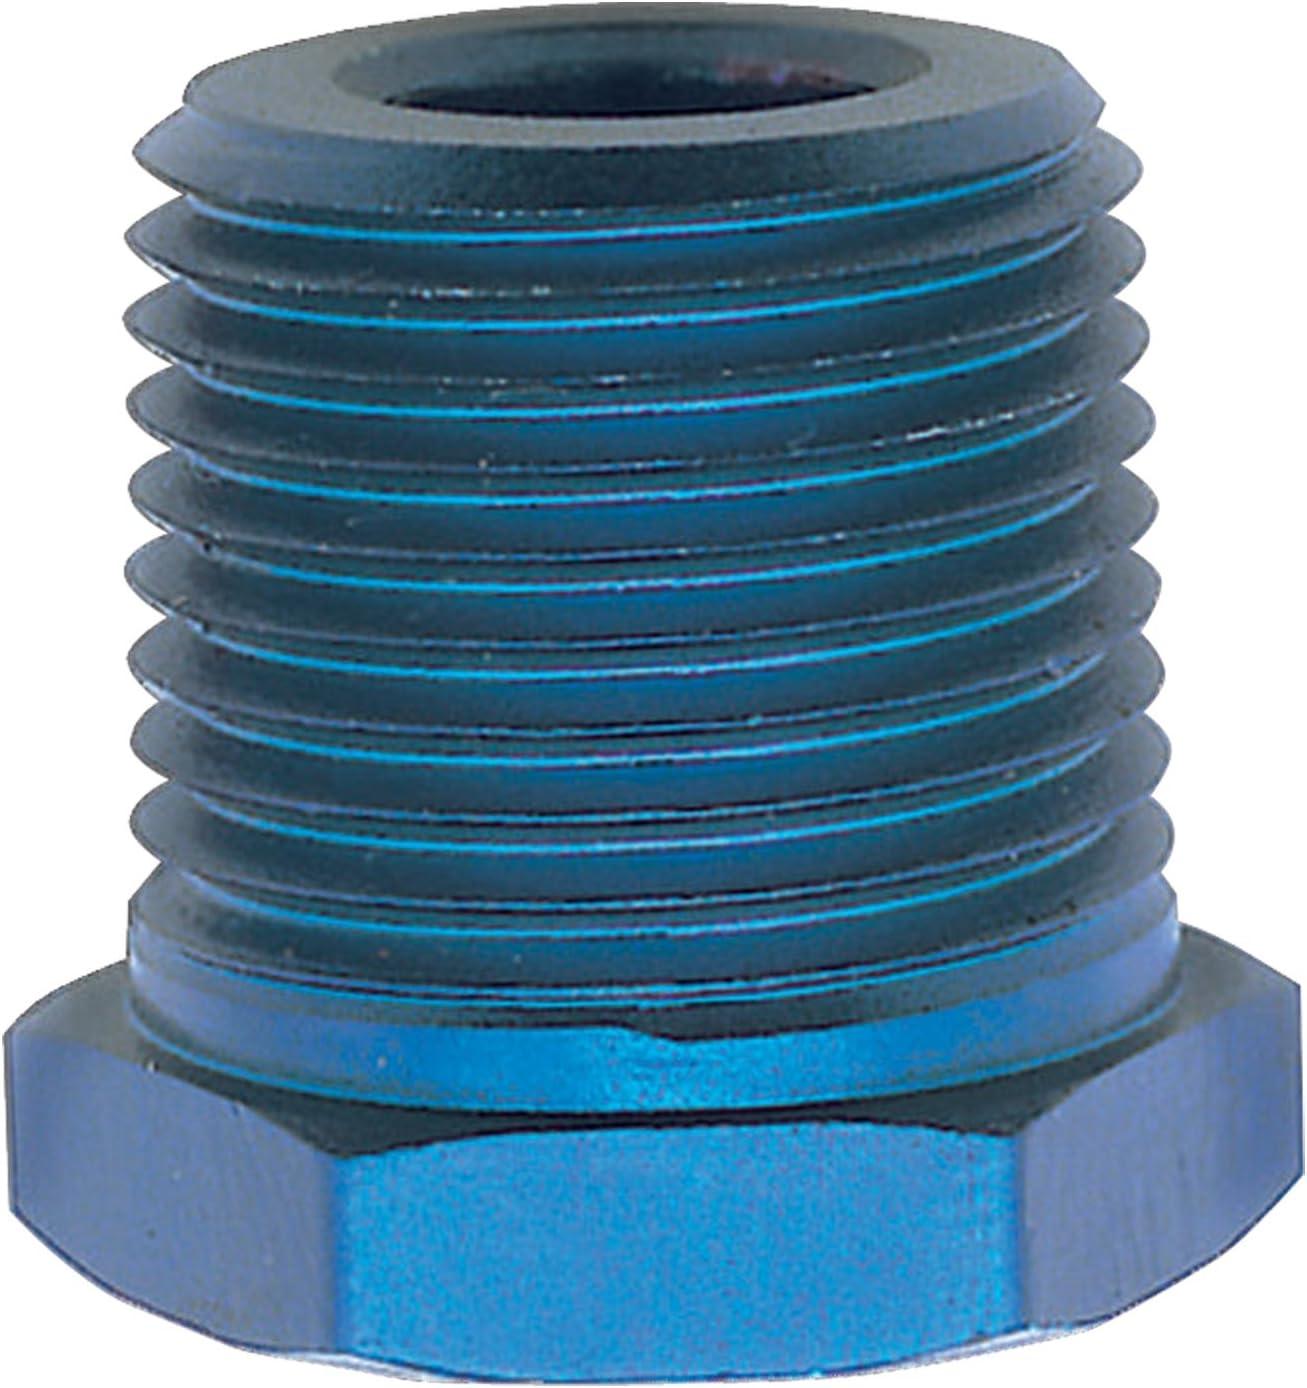 "Russell Pipe Fitting 661580; NPT Reducer Bushing Blue 1//2/"" NPT x 3//8/"" NPT Female"